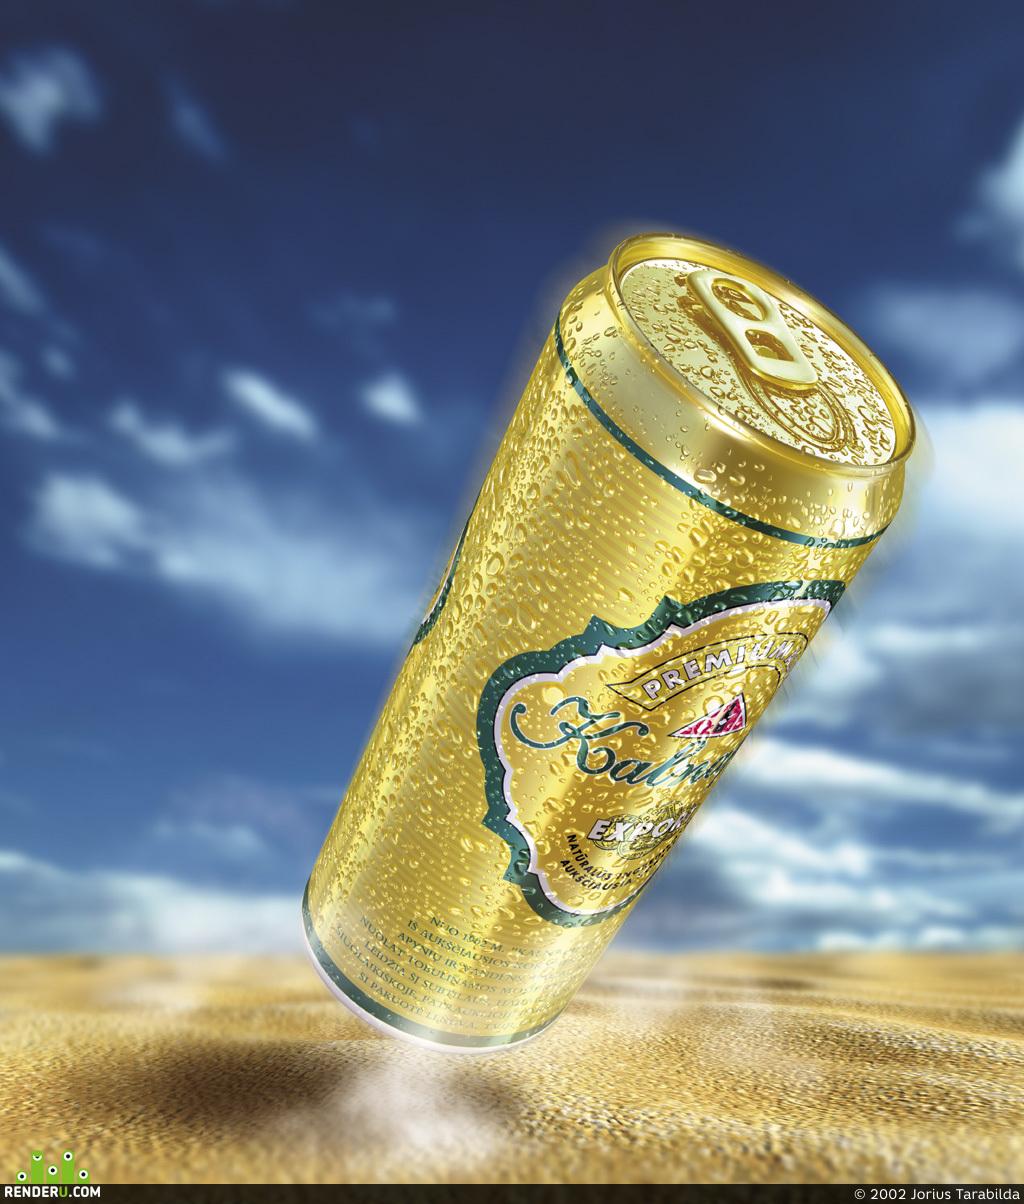 preview Reklama piva 2